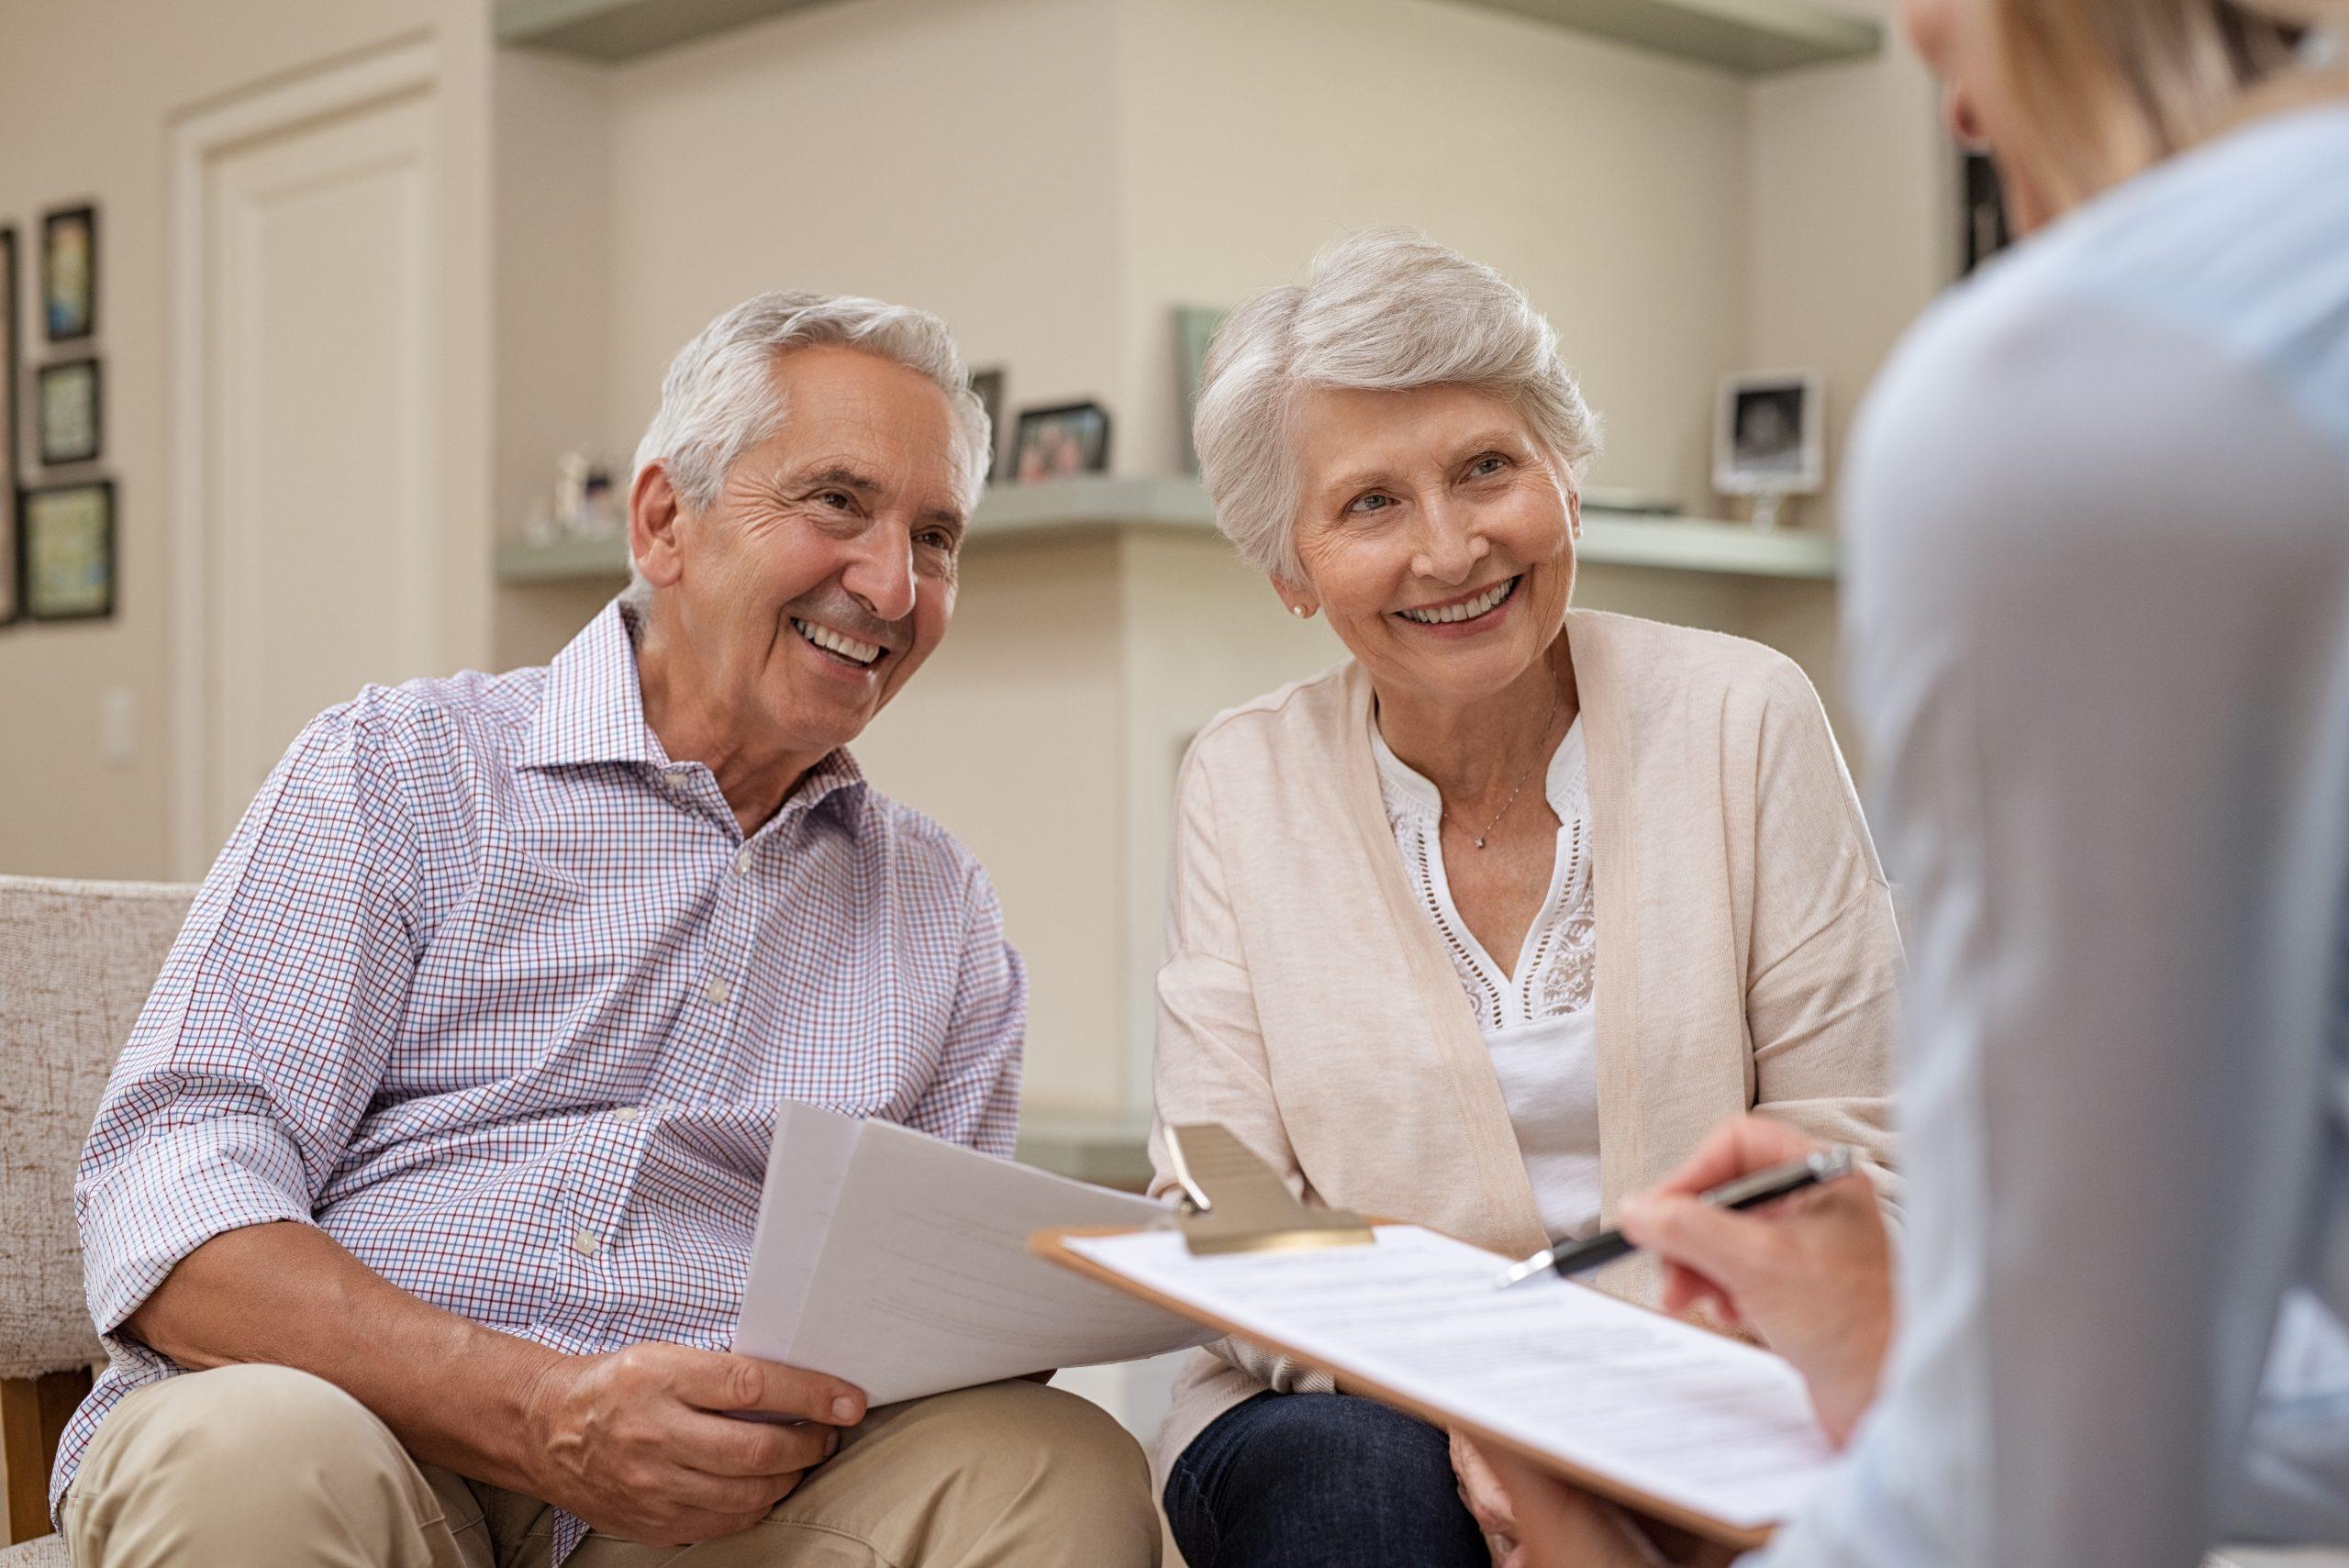 CCI Health & Wellness Services